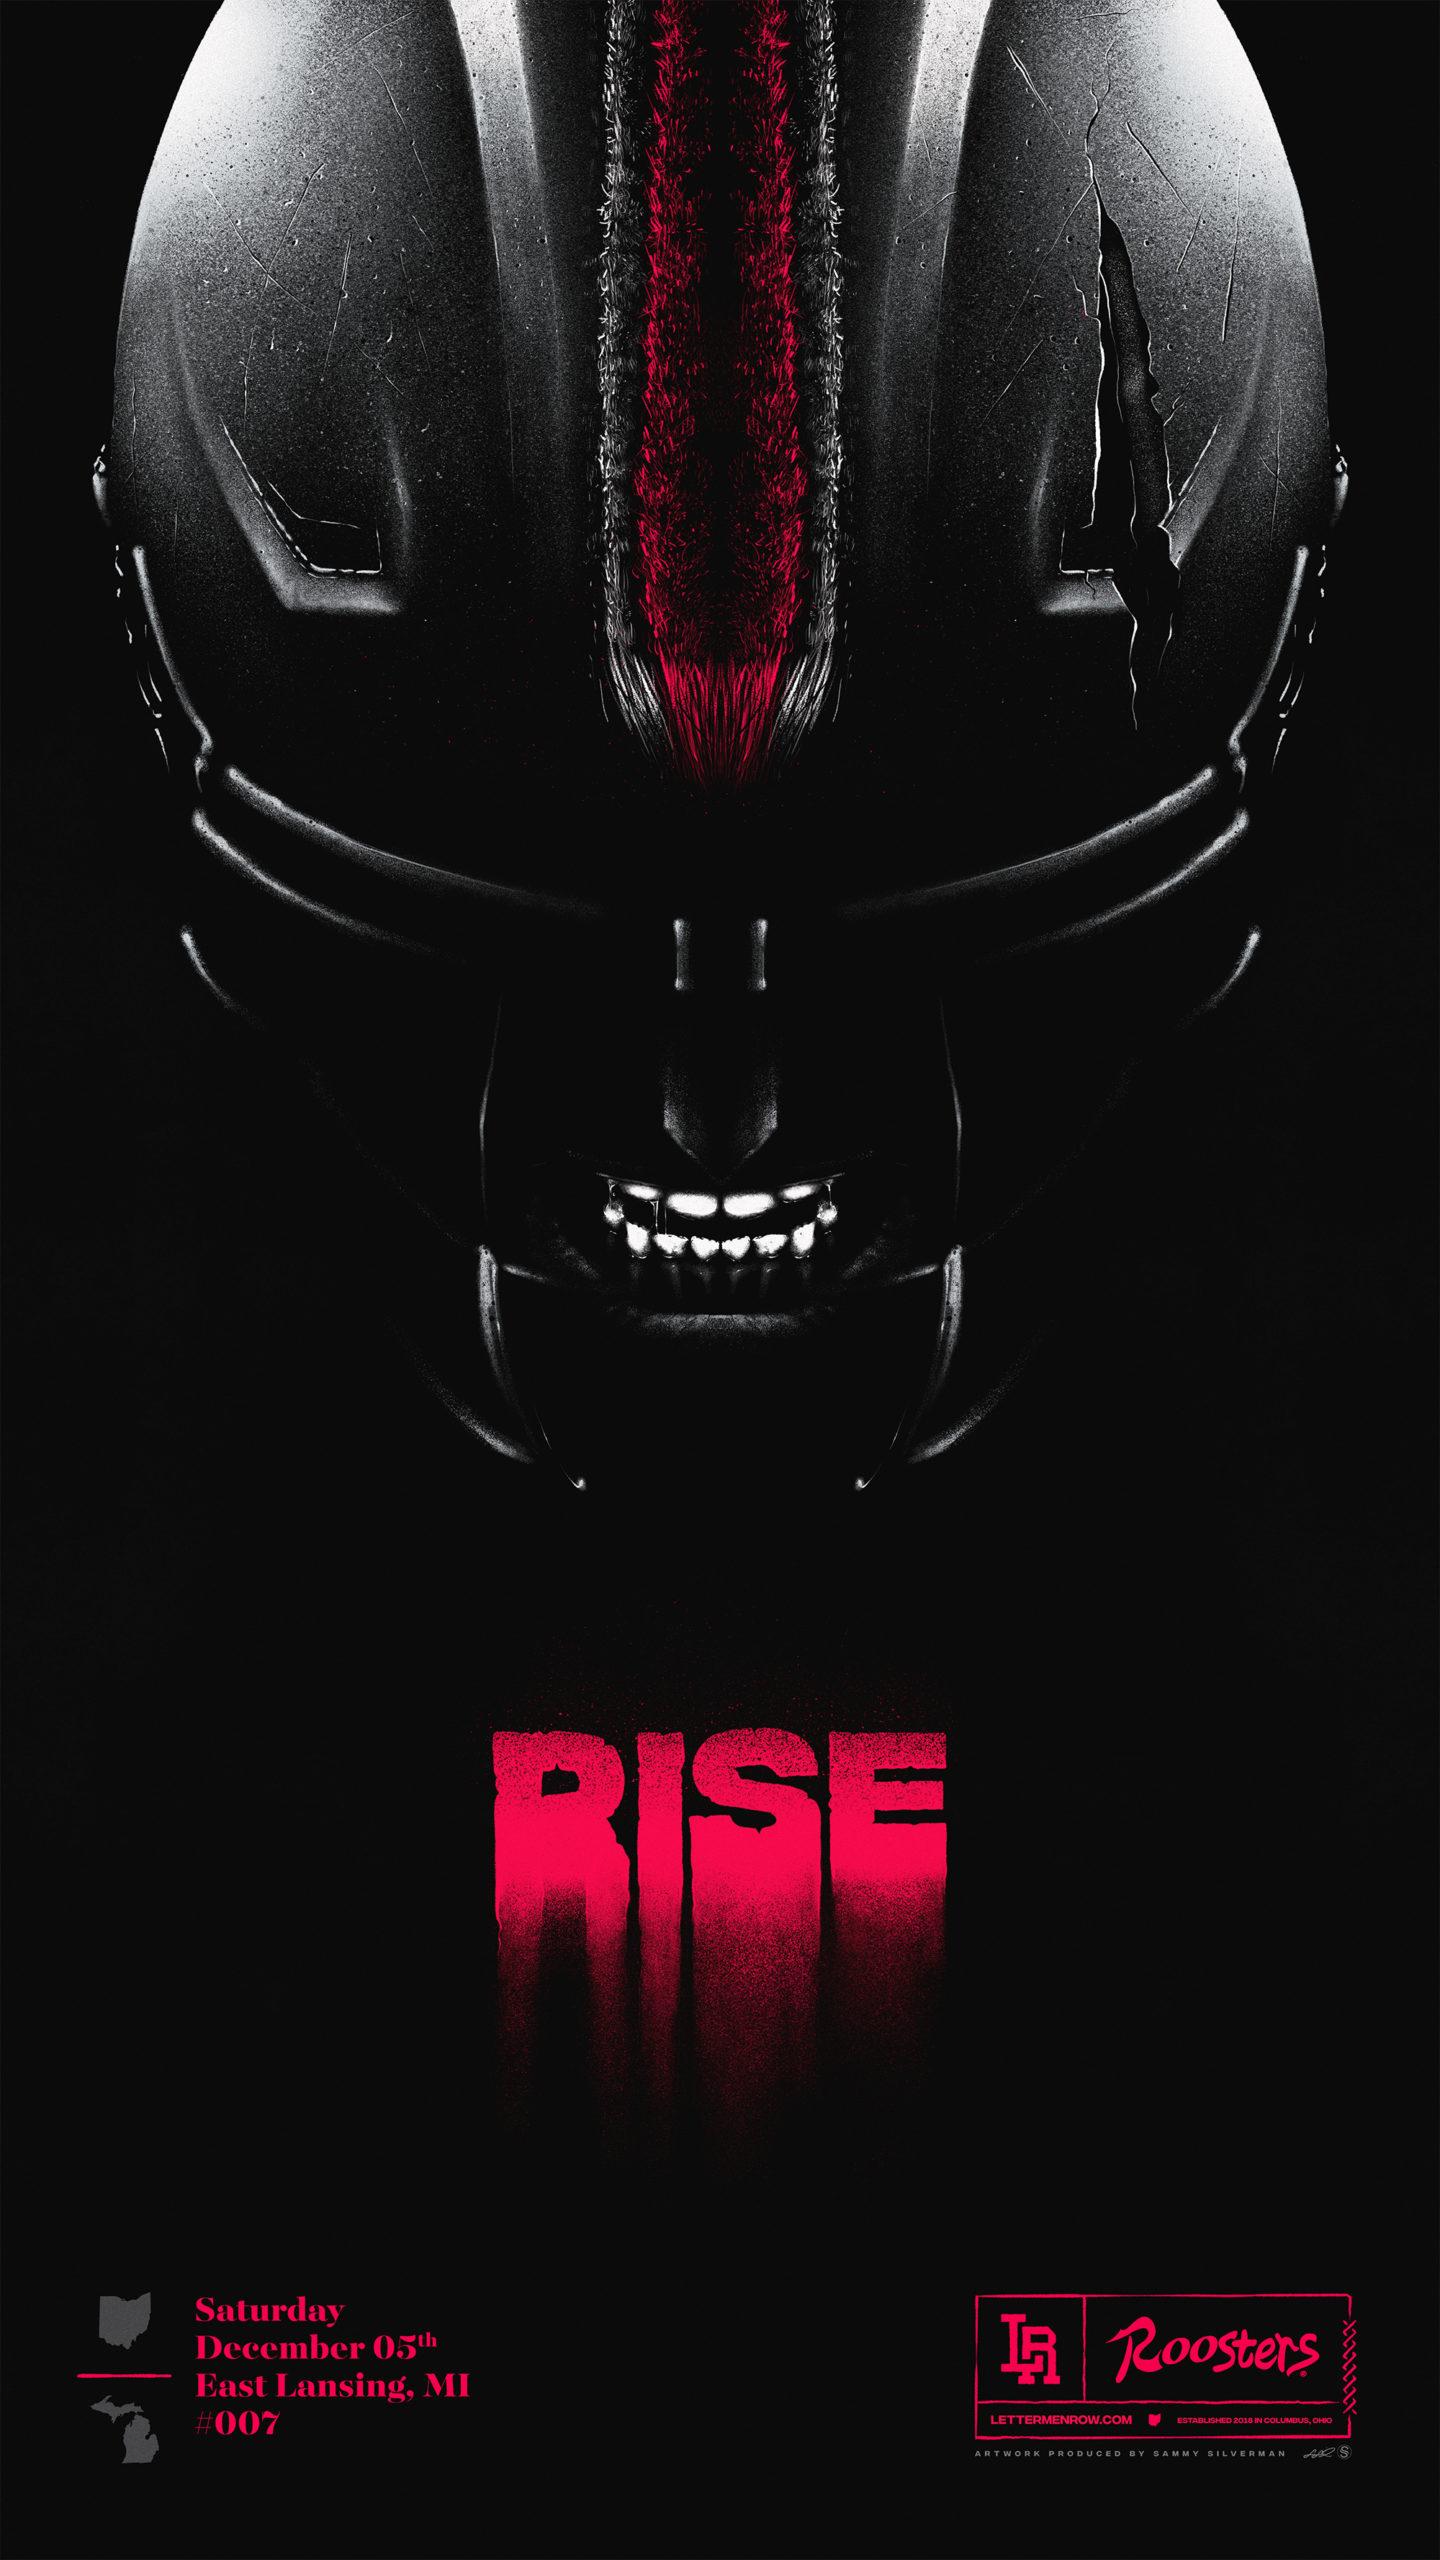 Game poster-Ohio State-Ohio State football-Buckeyes